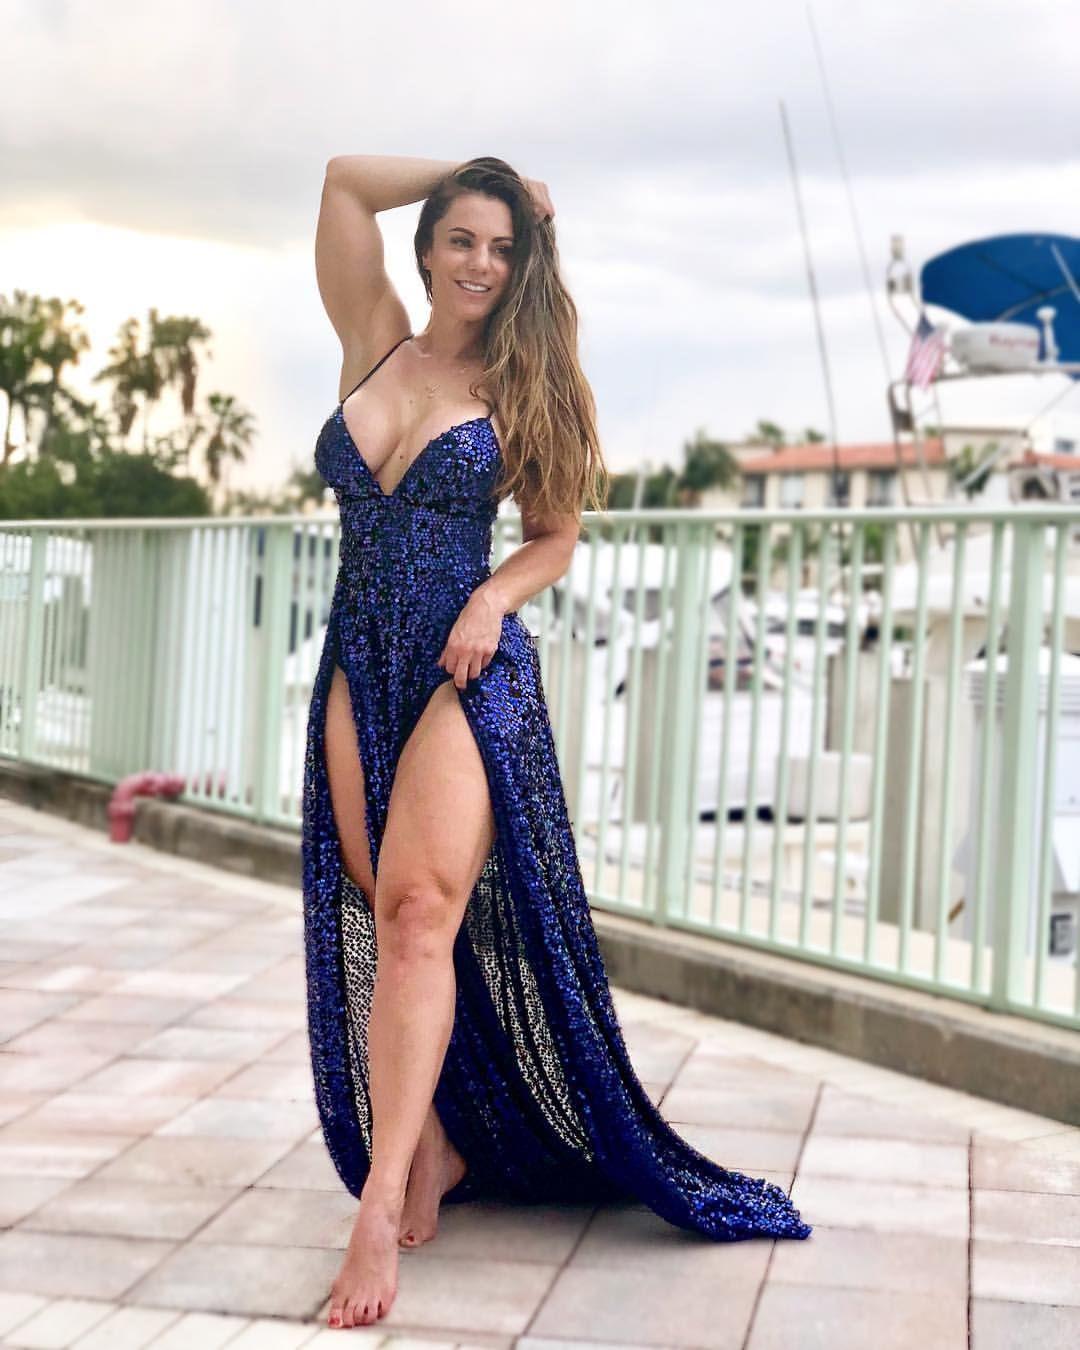 bra Celebrites Linda Durbesson naked photo 2017